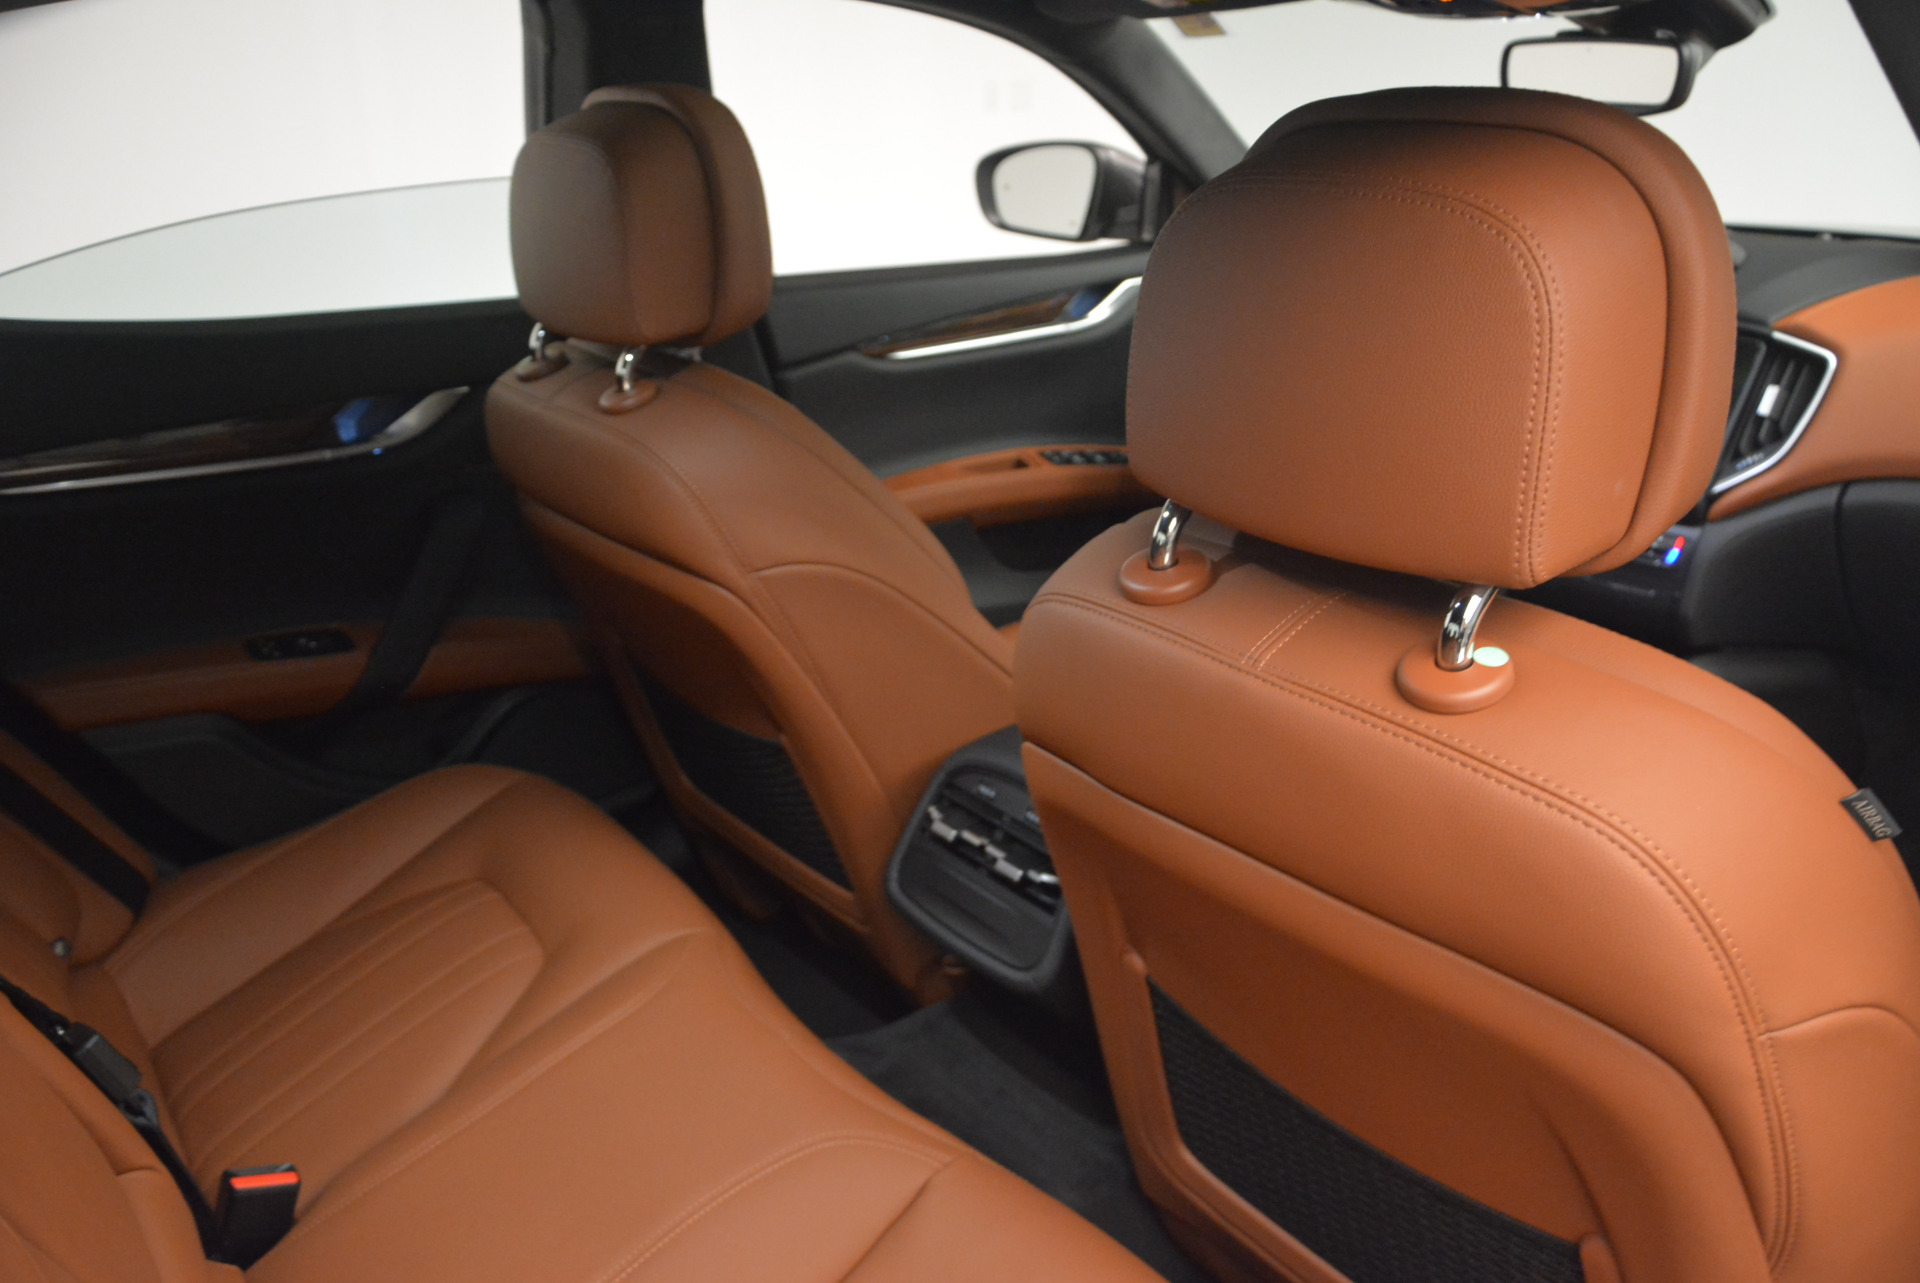 Used 2017 Maserati Ghibli S Q4  EX-LOANER For Sale In Greenwich, CT. Alfa Romeo of Greenwich, W311 565_p22